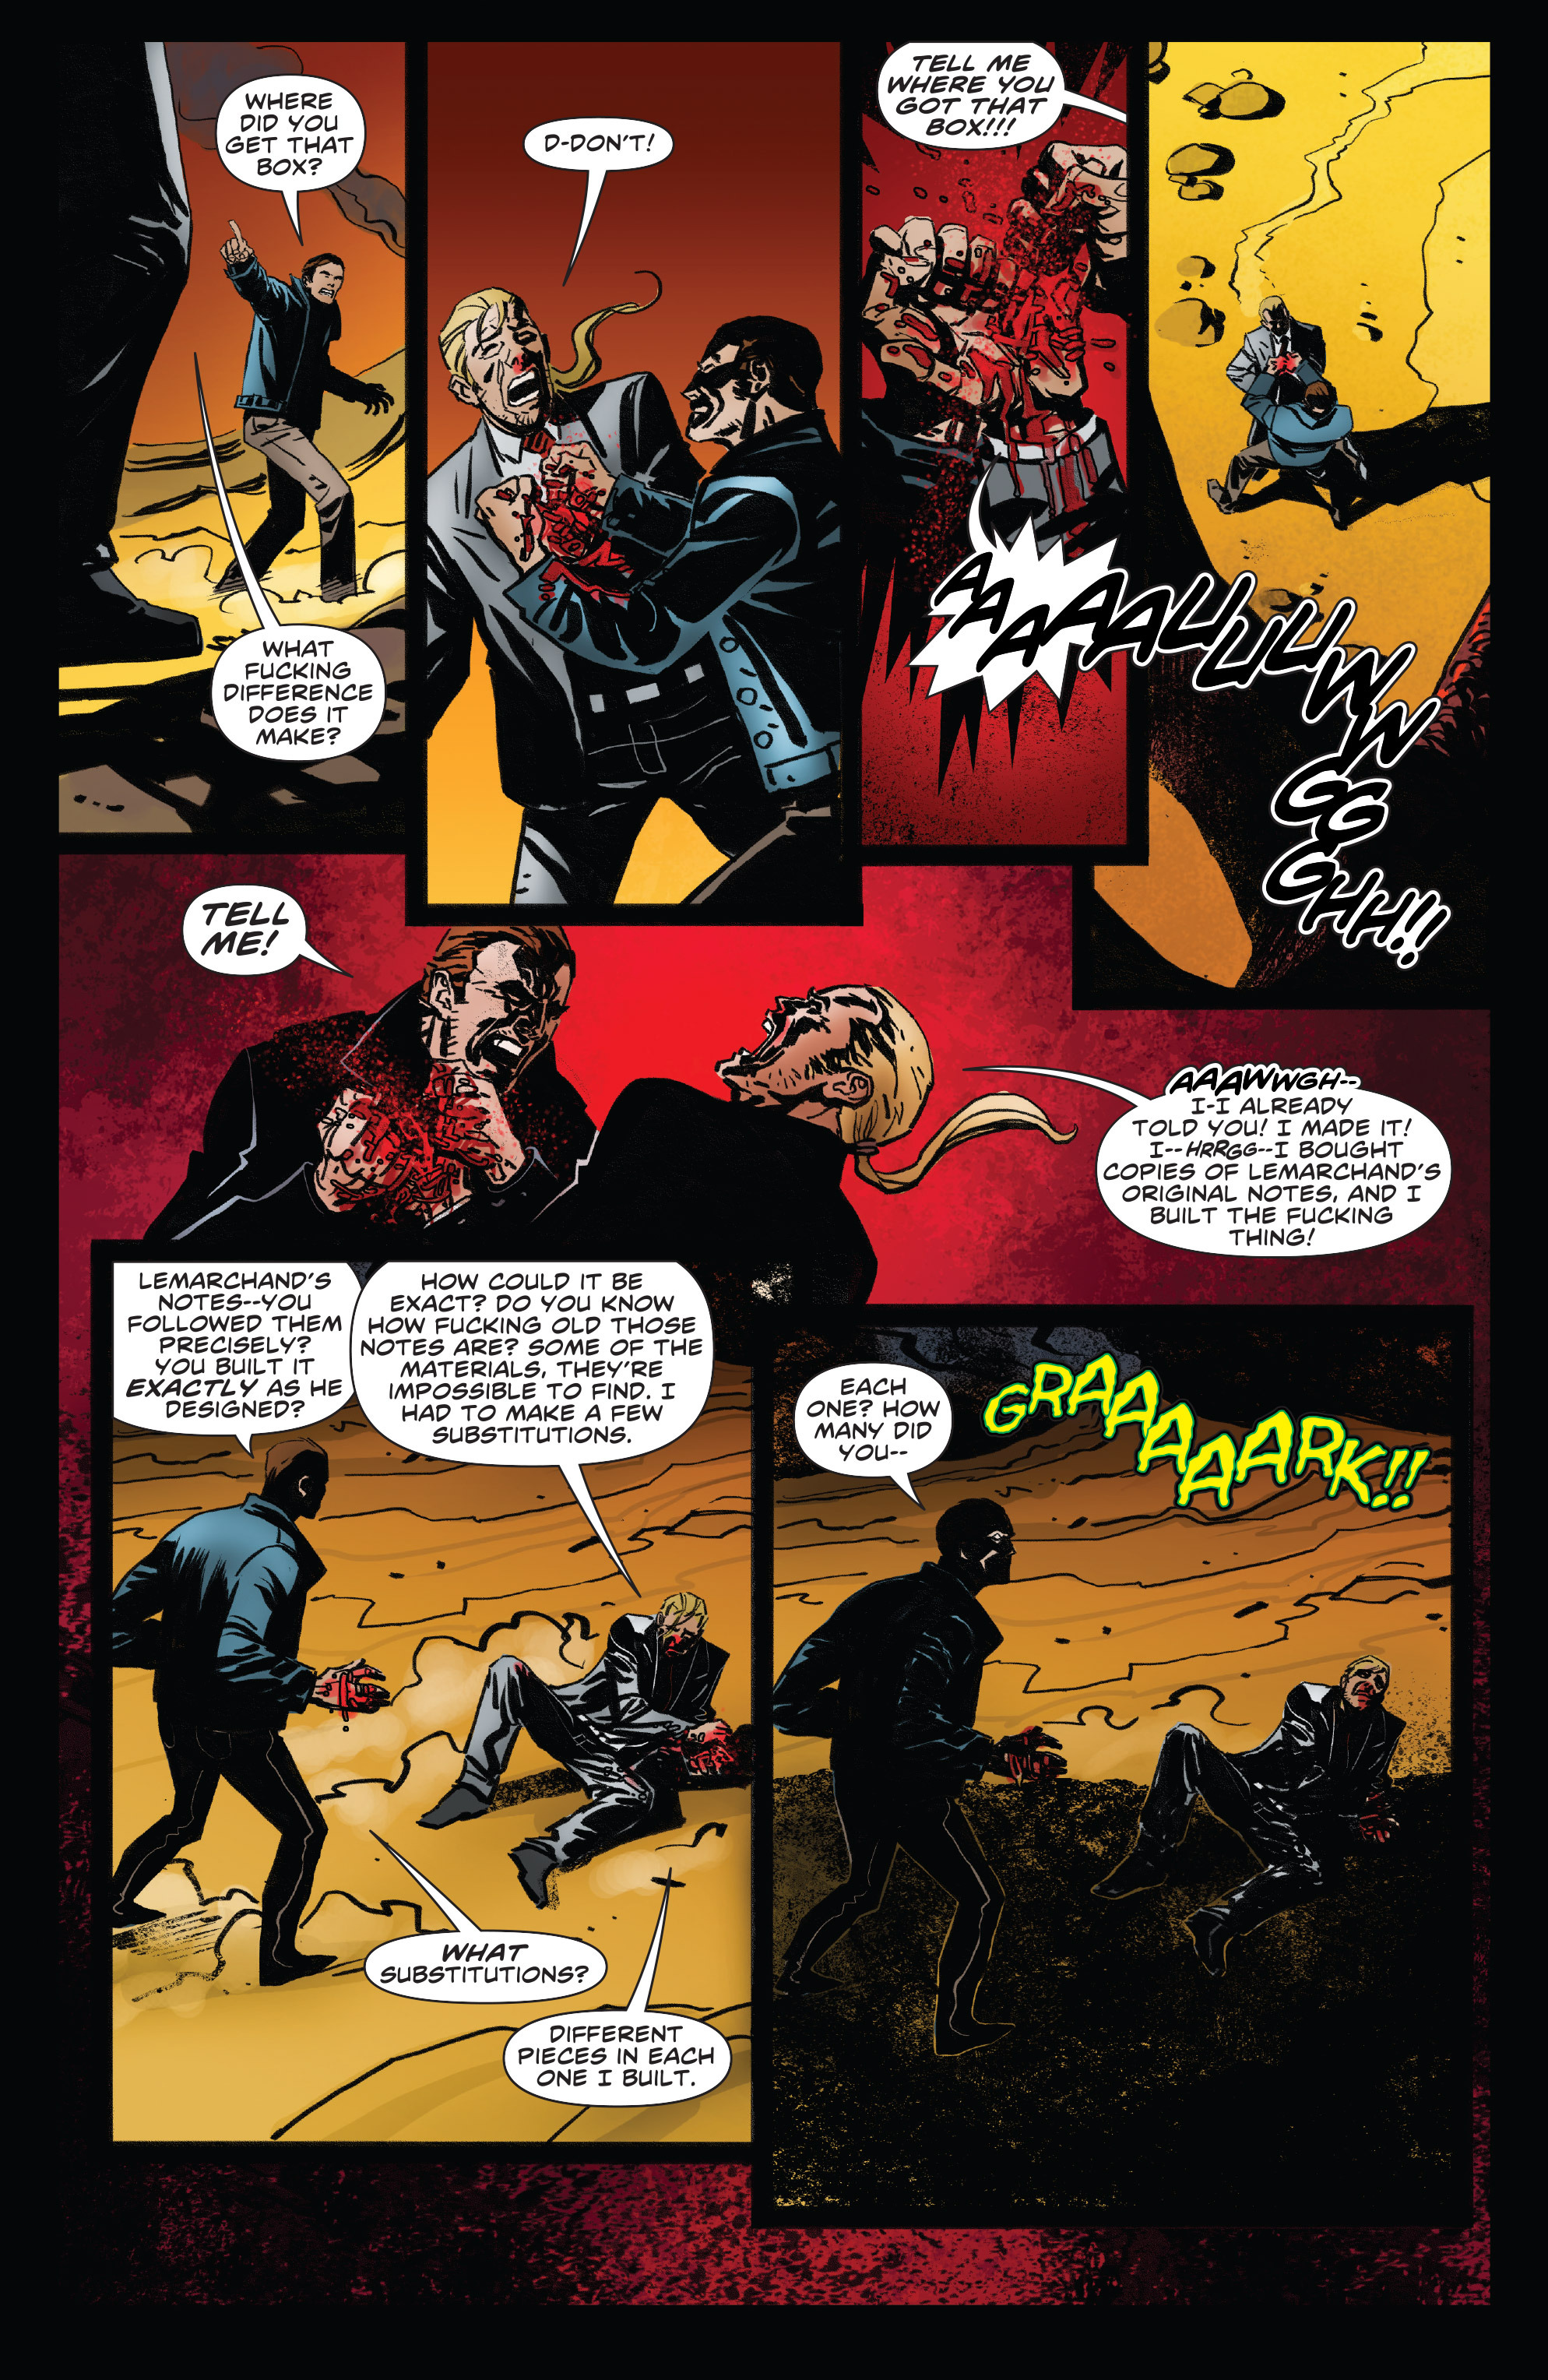 Read online Clive Barker's Hellraiser: The Dark Watch comic -  Issue # TPB 3 - 25